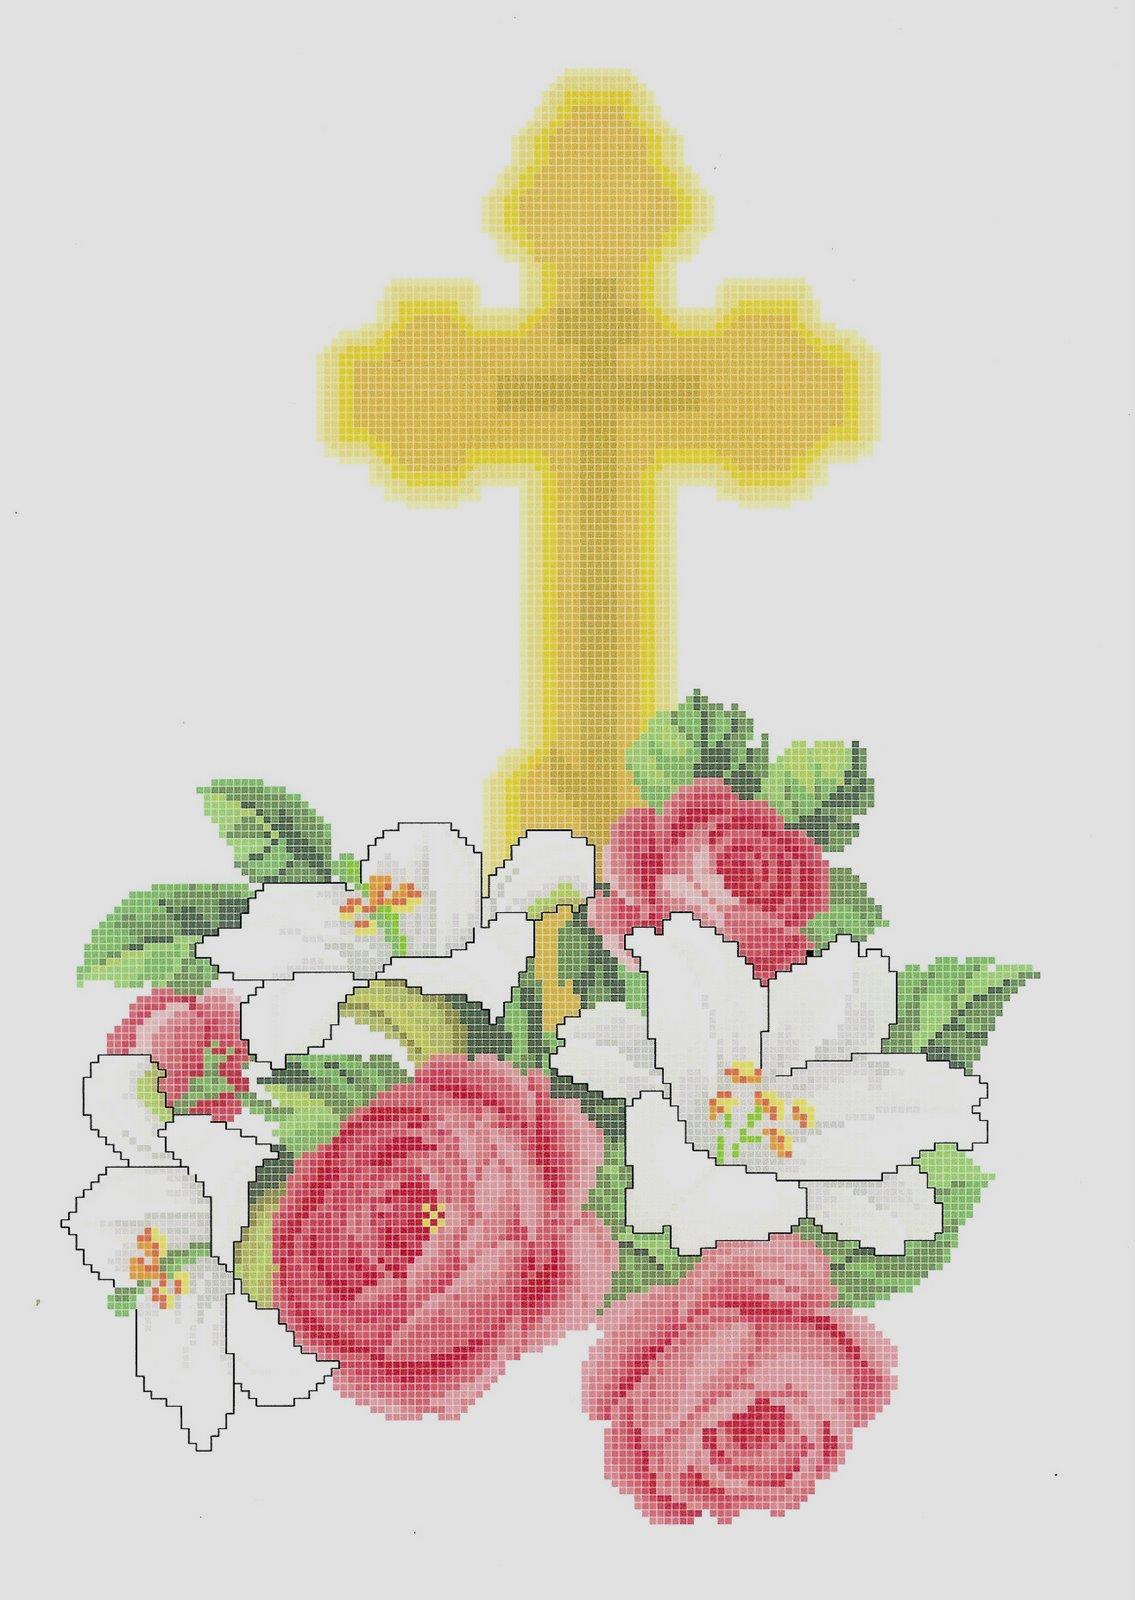 [St.+Olga+Cross+with+Flowers]